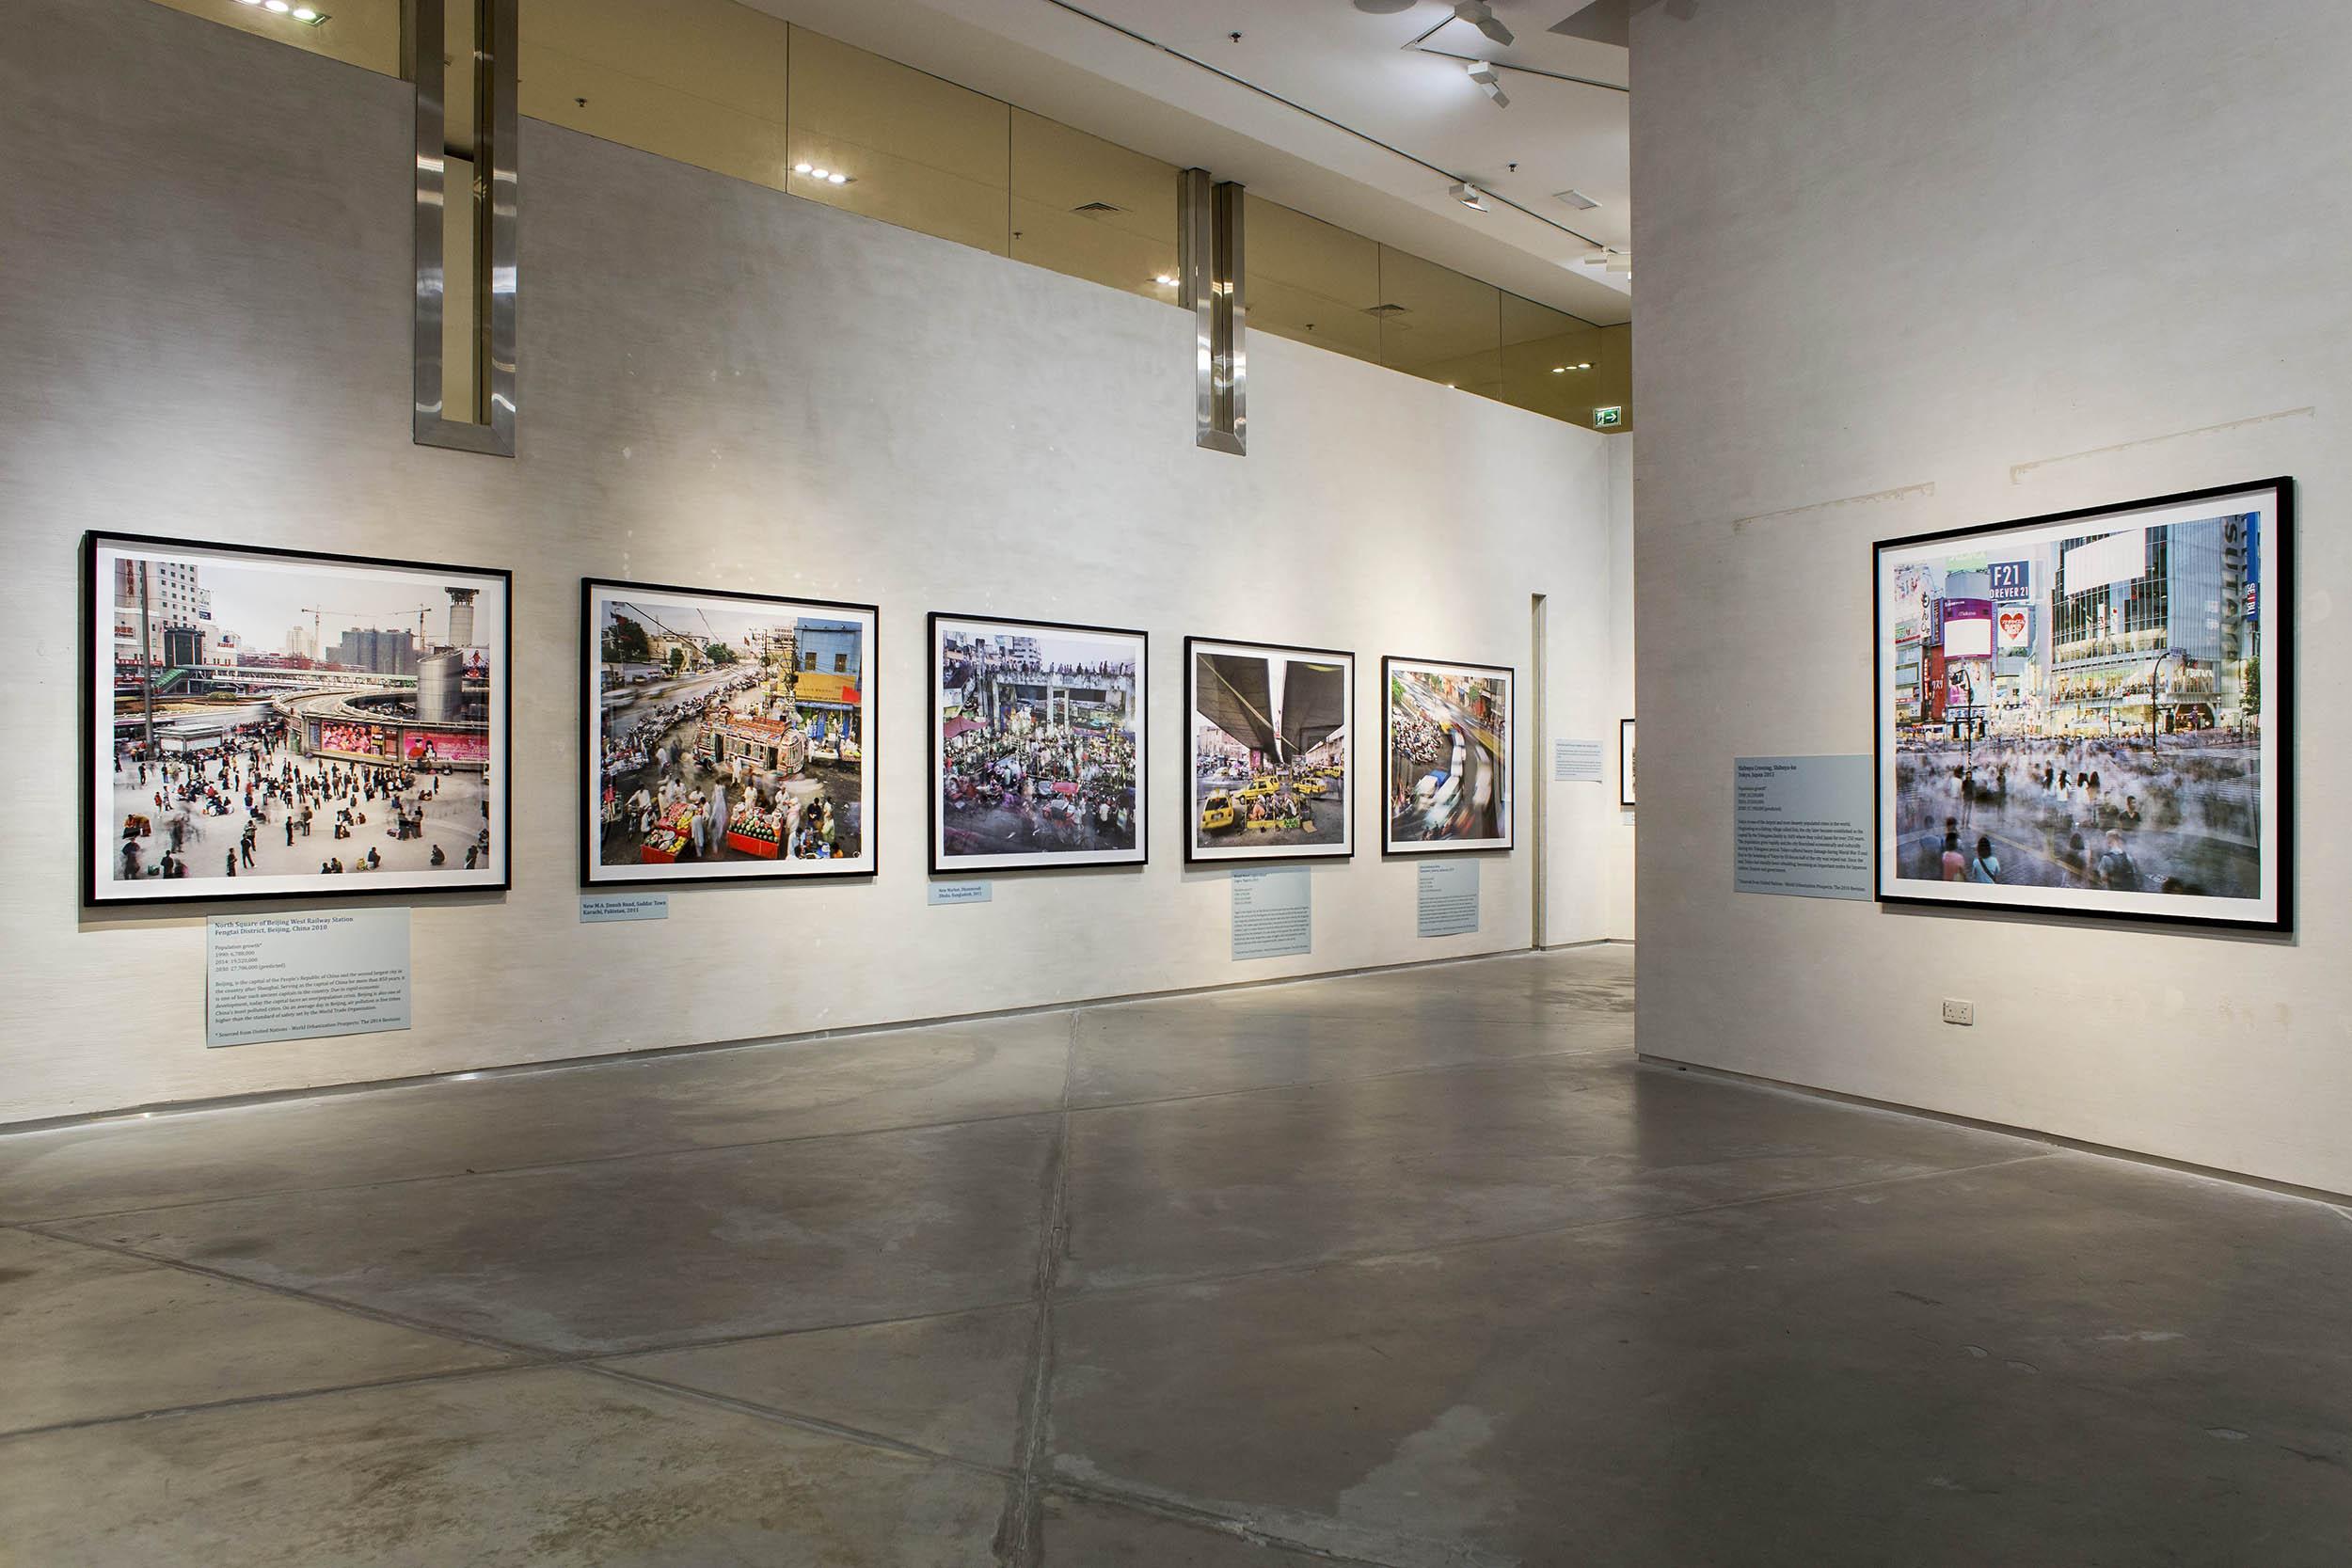 East Wing Gallery, Dubai, 2016